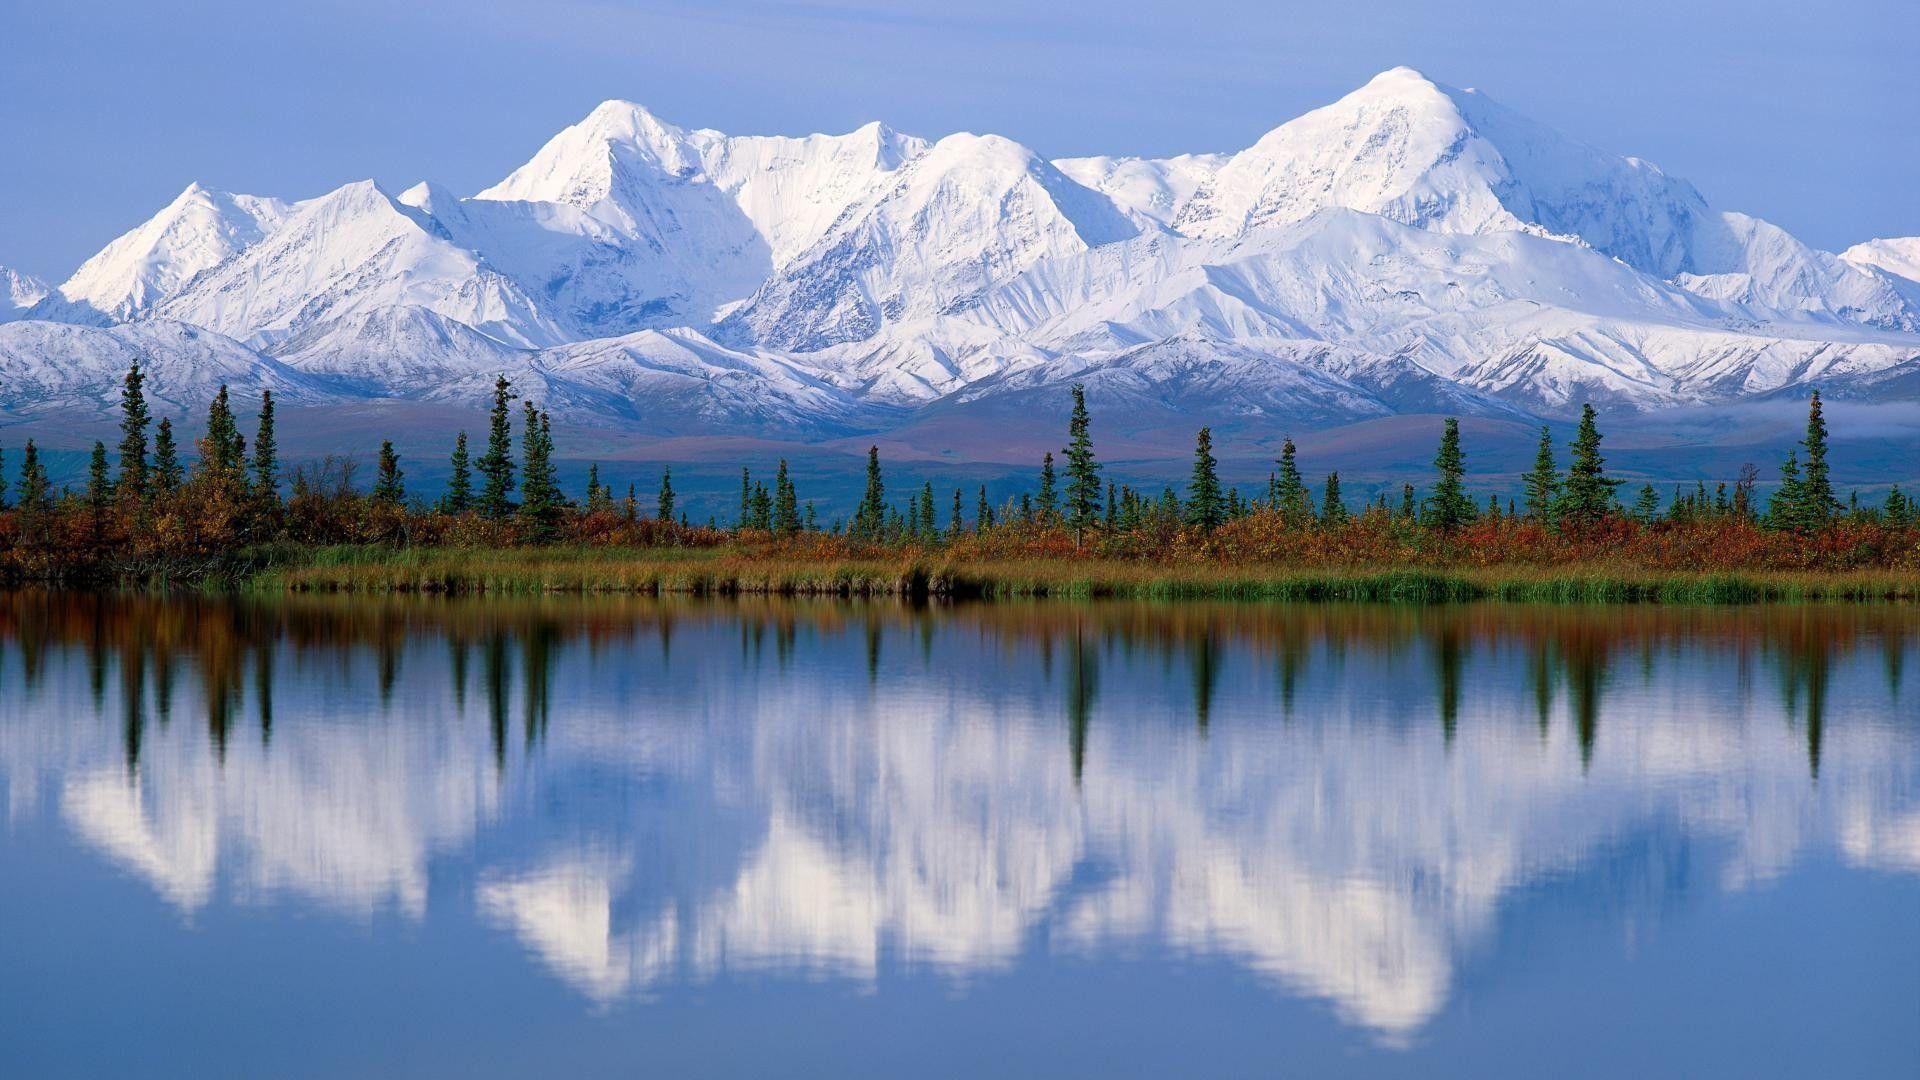 Alaska Desktop Wallpapers Top Free Alaska Desktop Backgrounds Wallpaperaccess